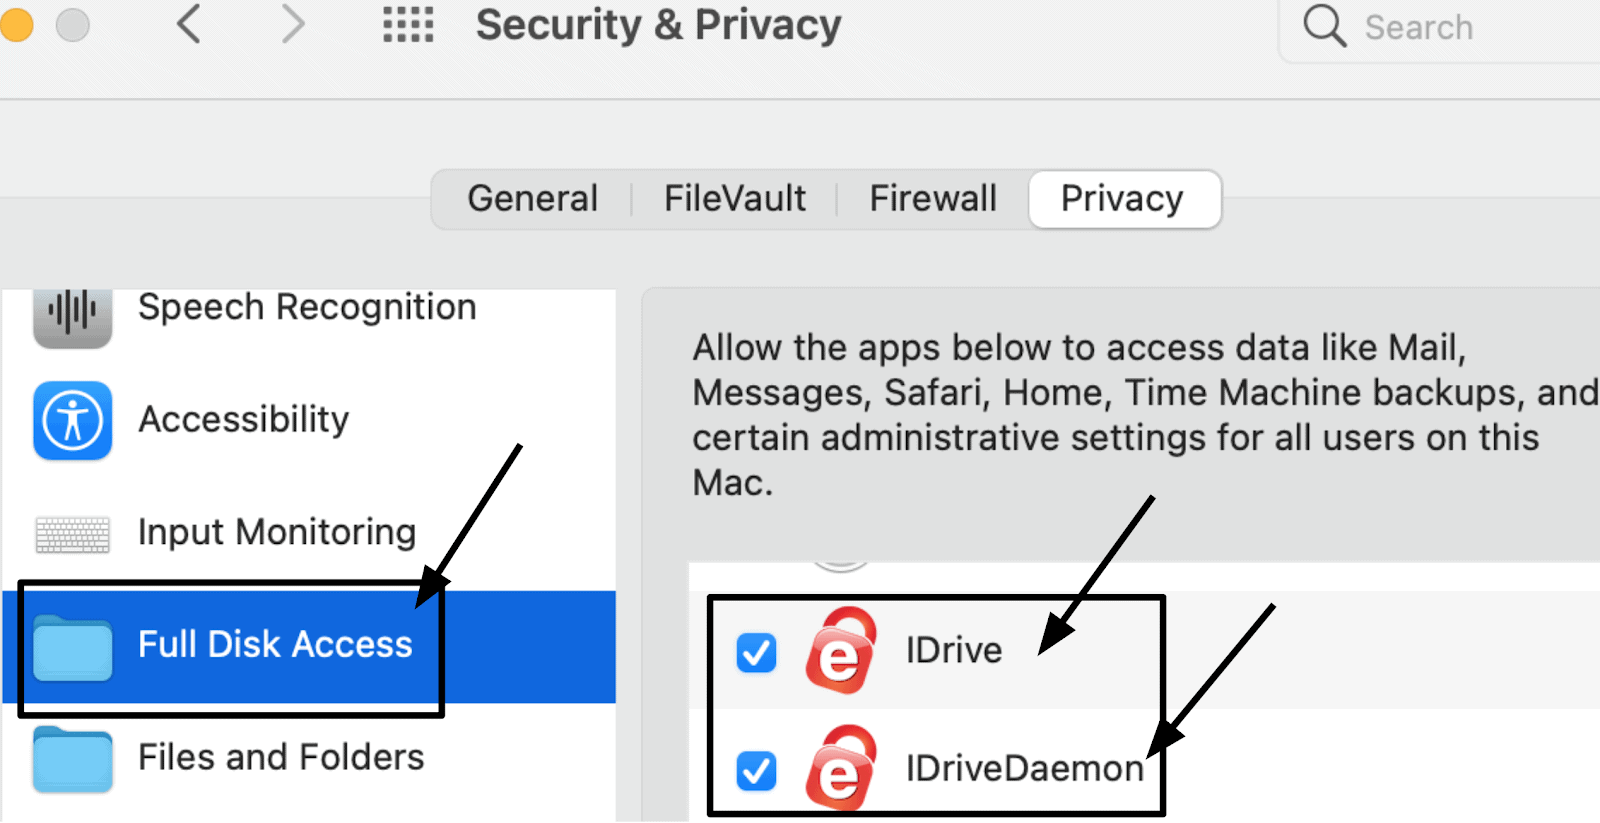 Mac privacy settings for IDrive